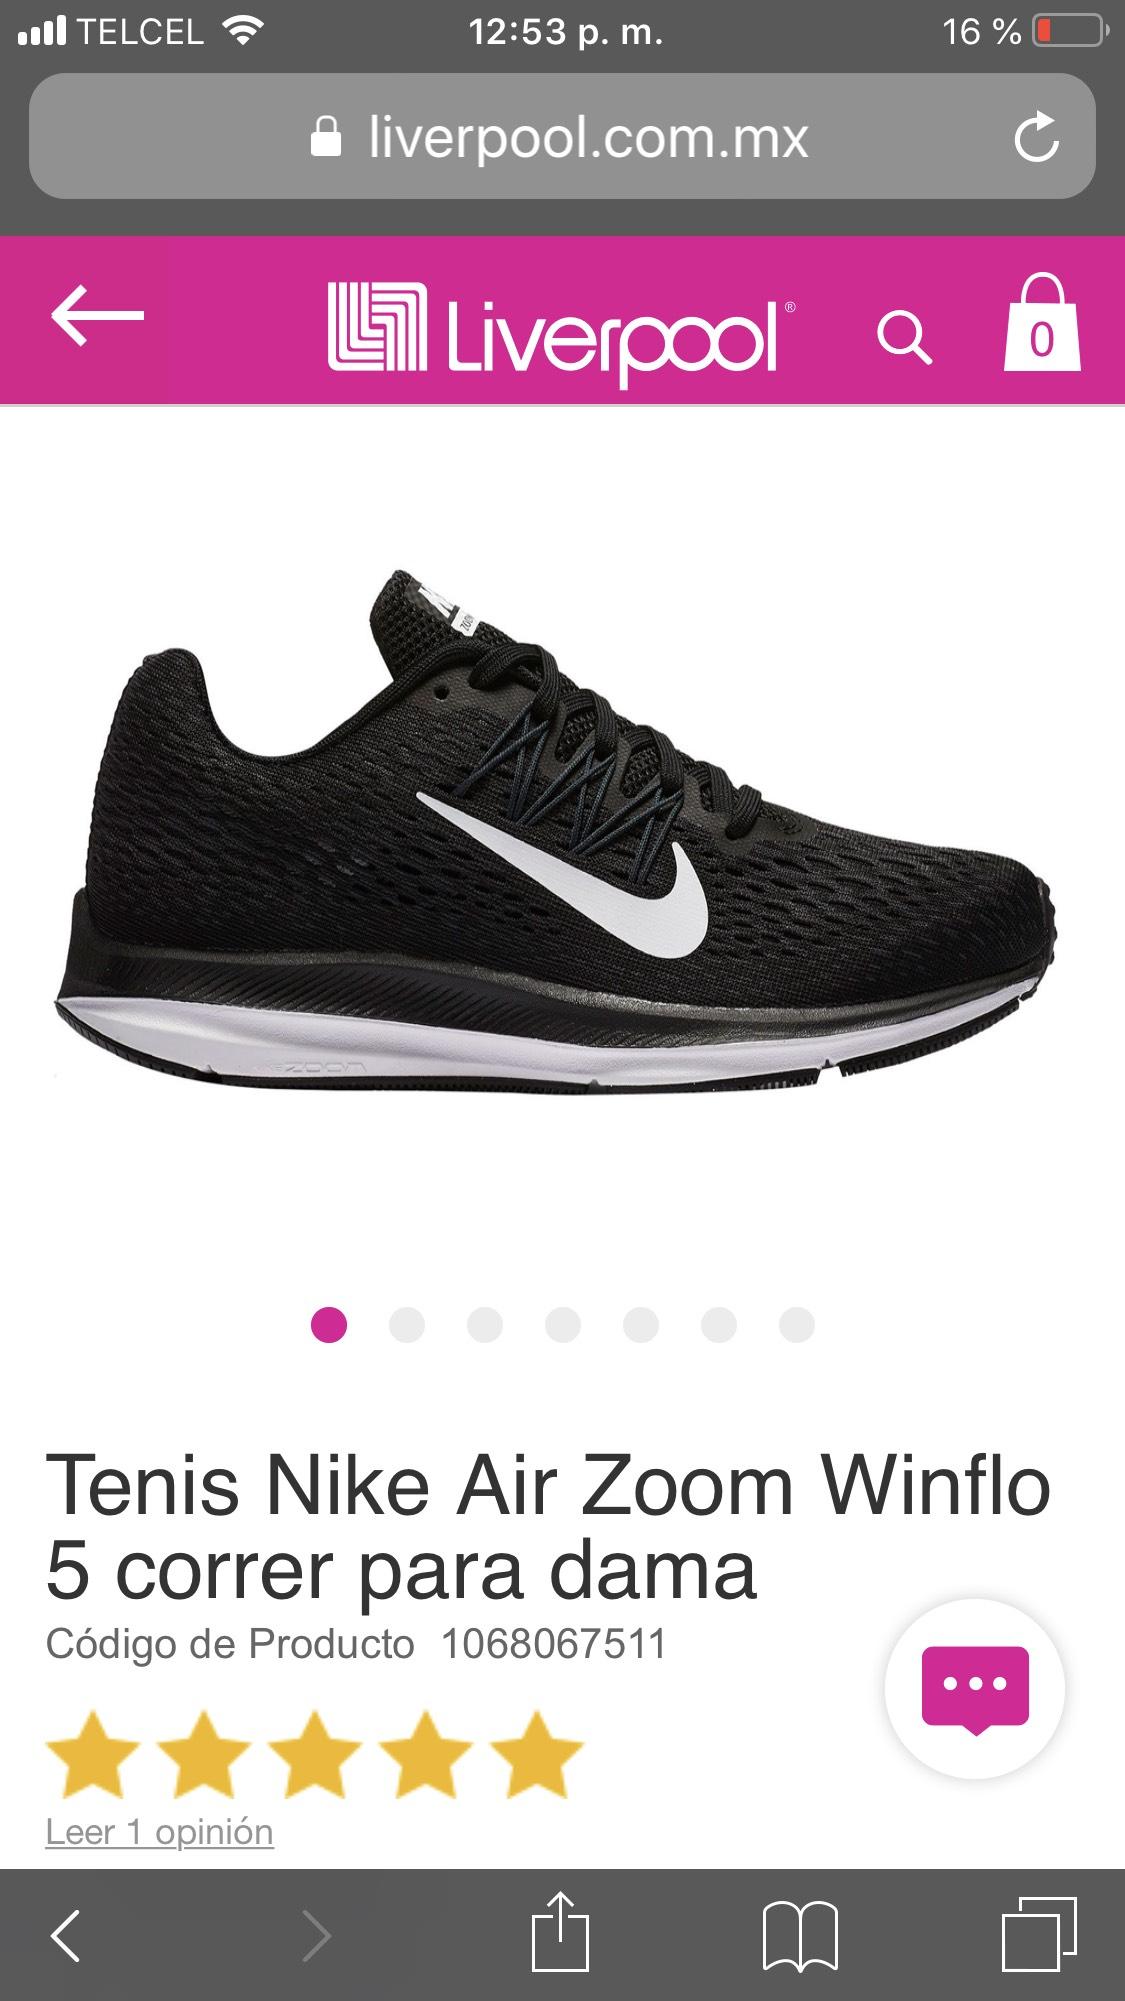 Liverpool: Tenis Nike Air Zoom Dama